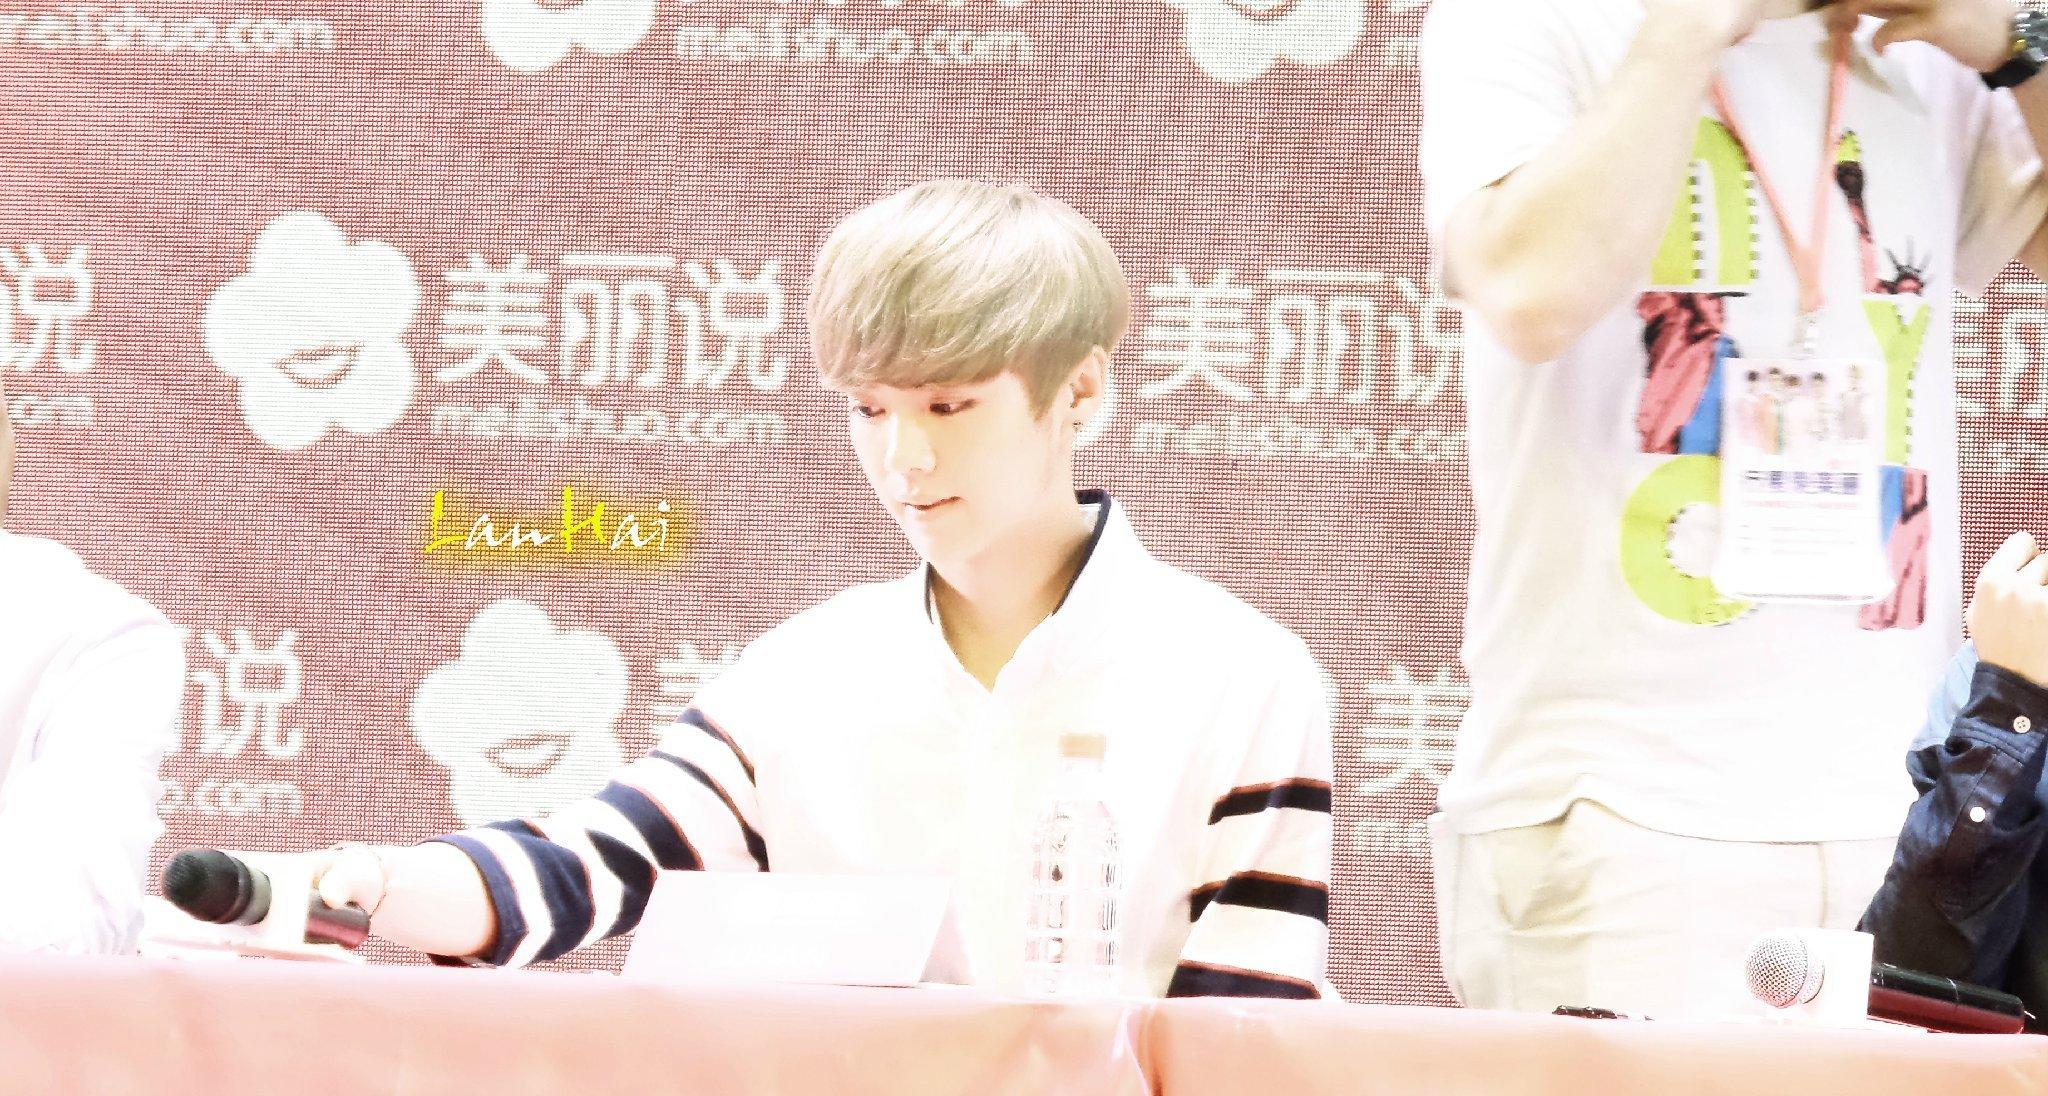 140728 Luhan at Meilishou Fansign -2